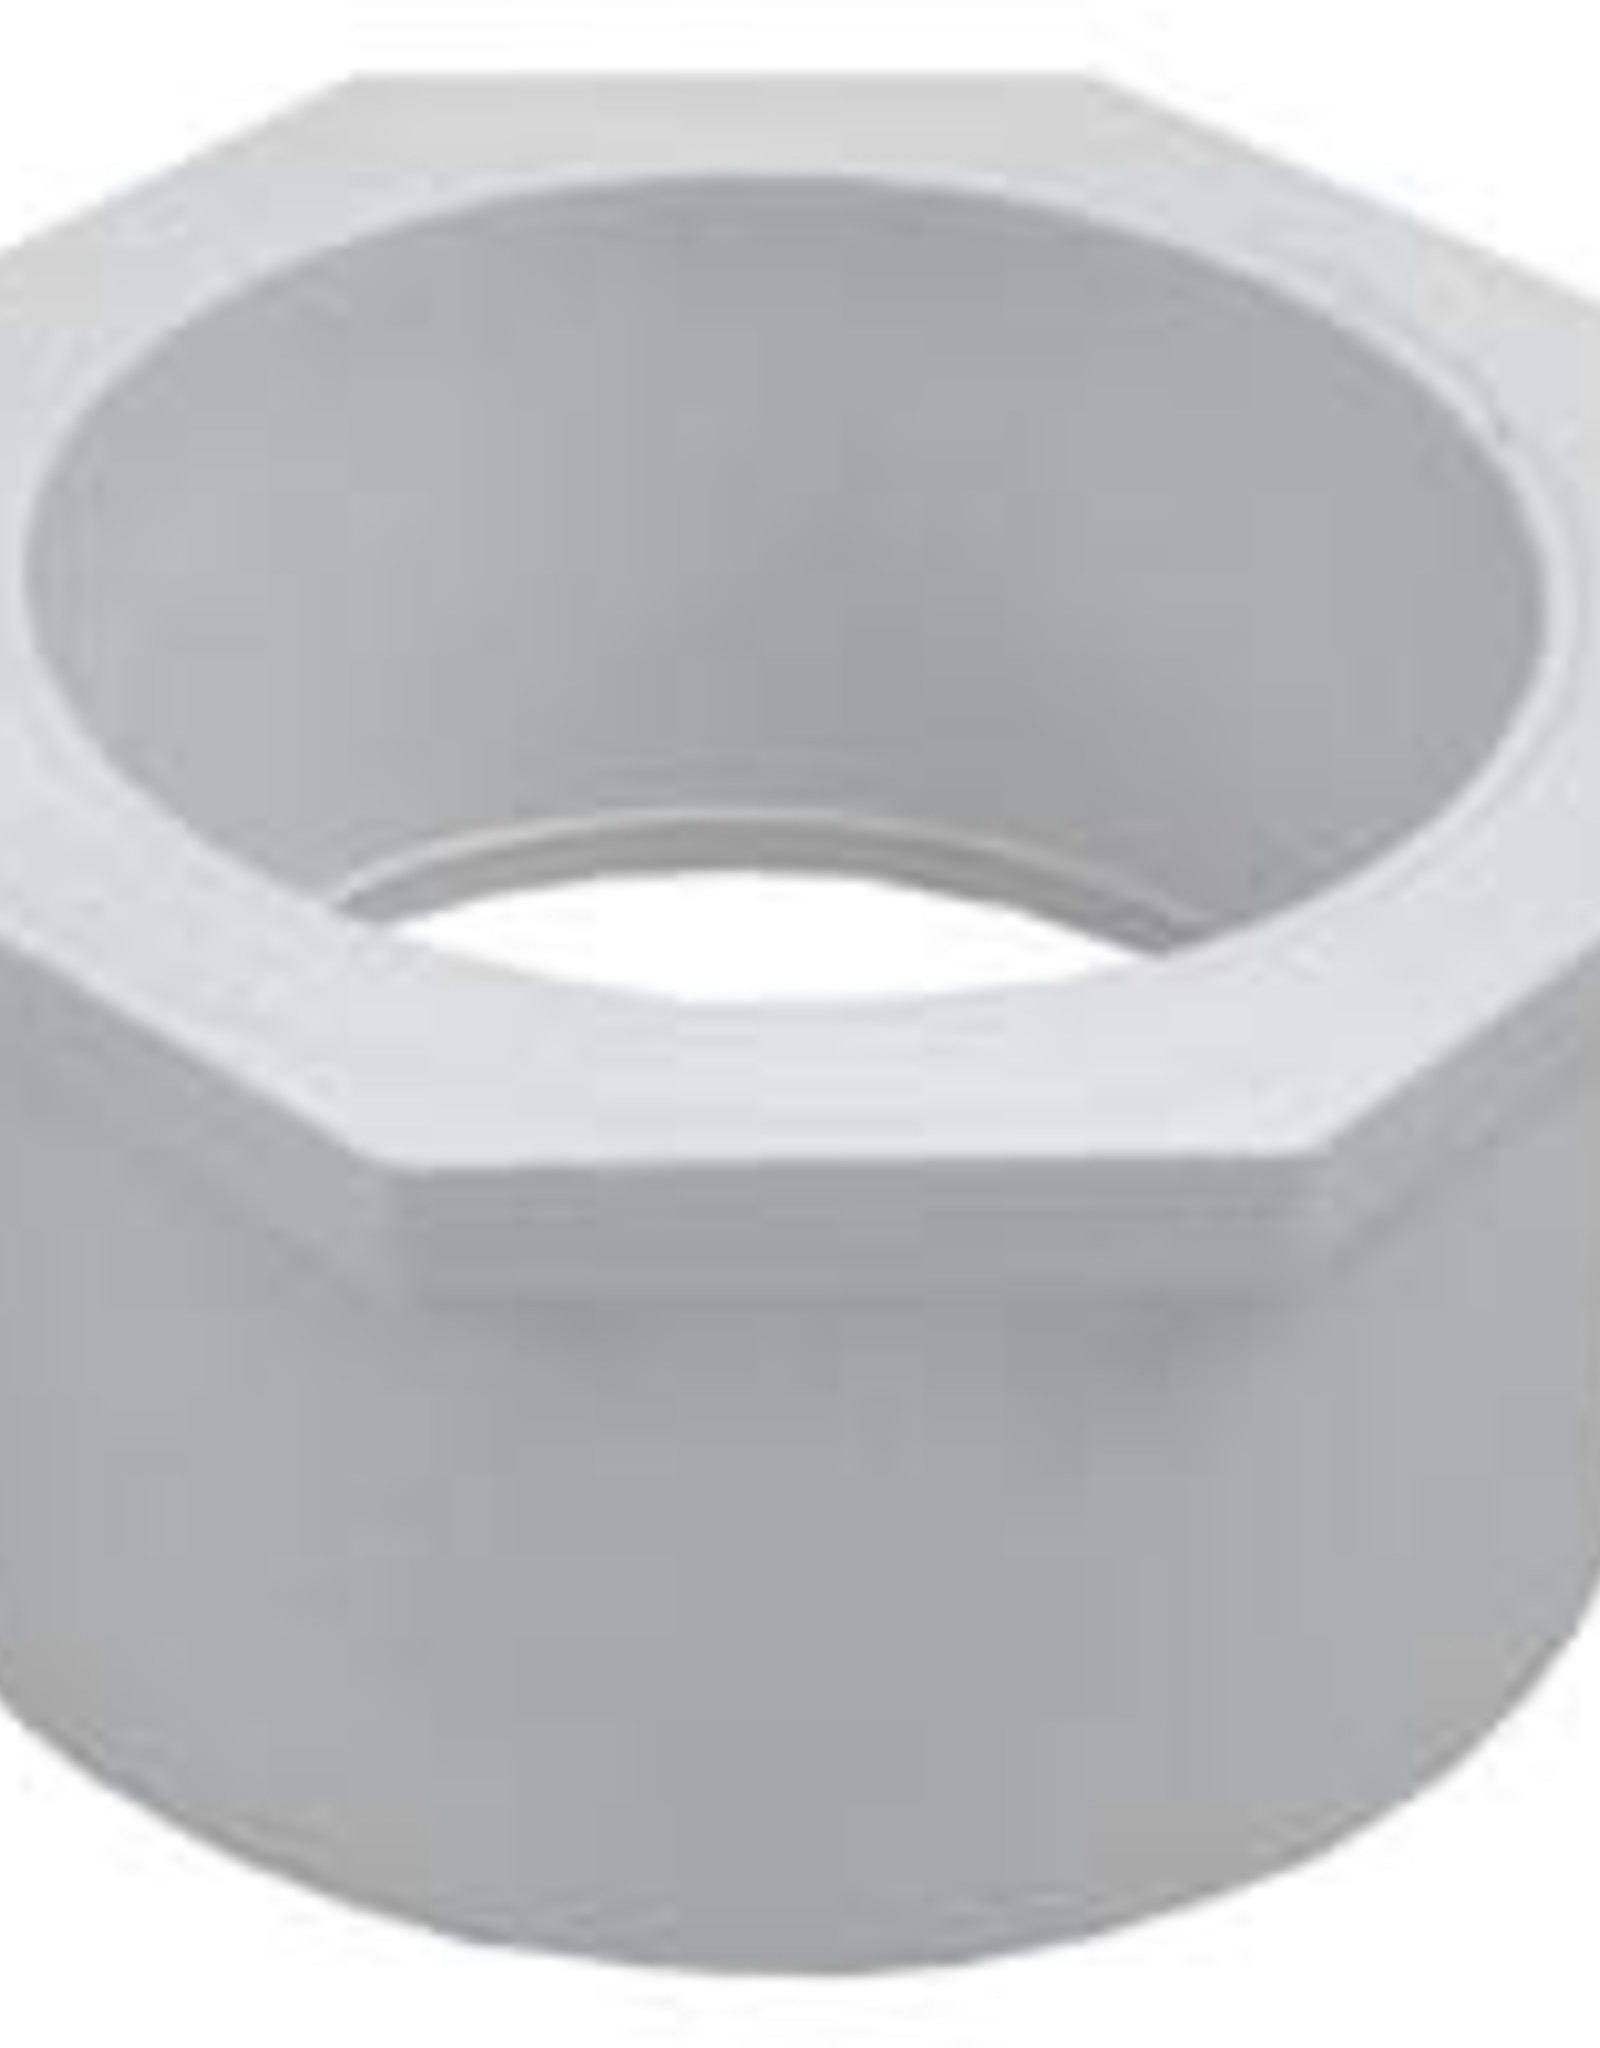 "LASCO PVC 1.5"" x 1 1/4"" Reducing Bushing Slip x Slip  SCH 40"